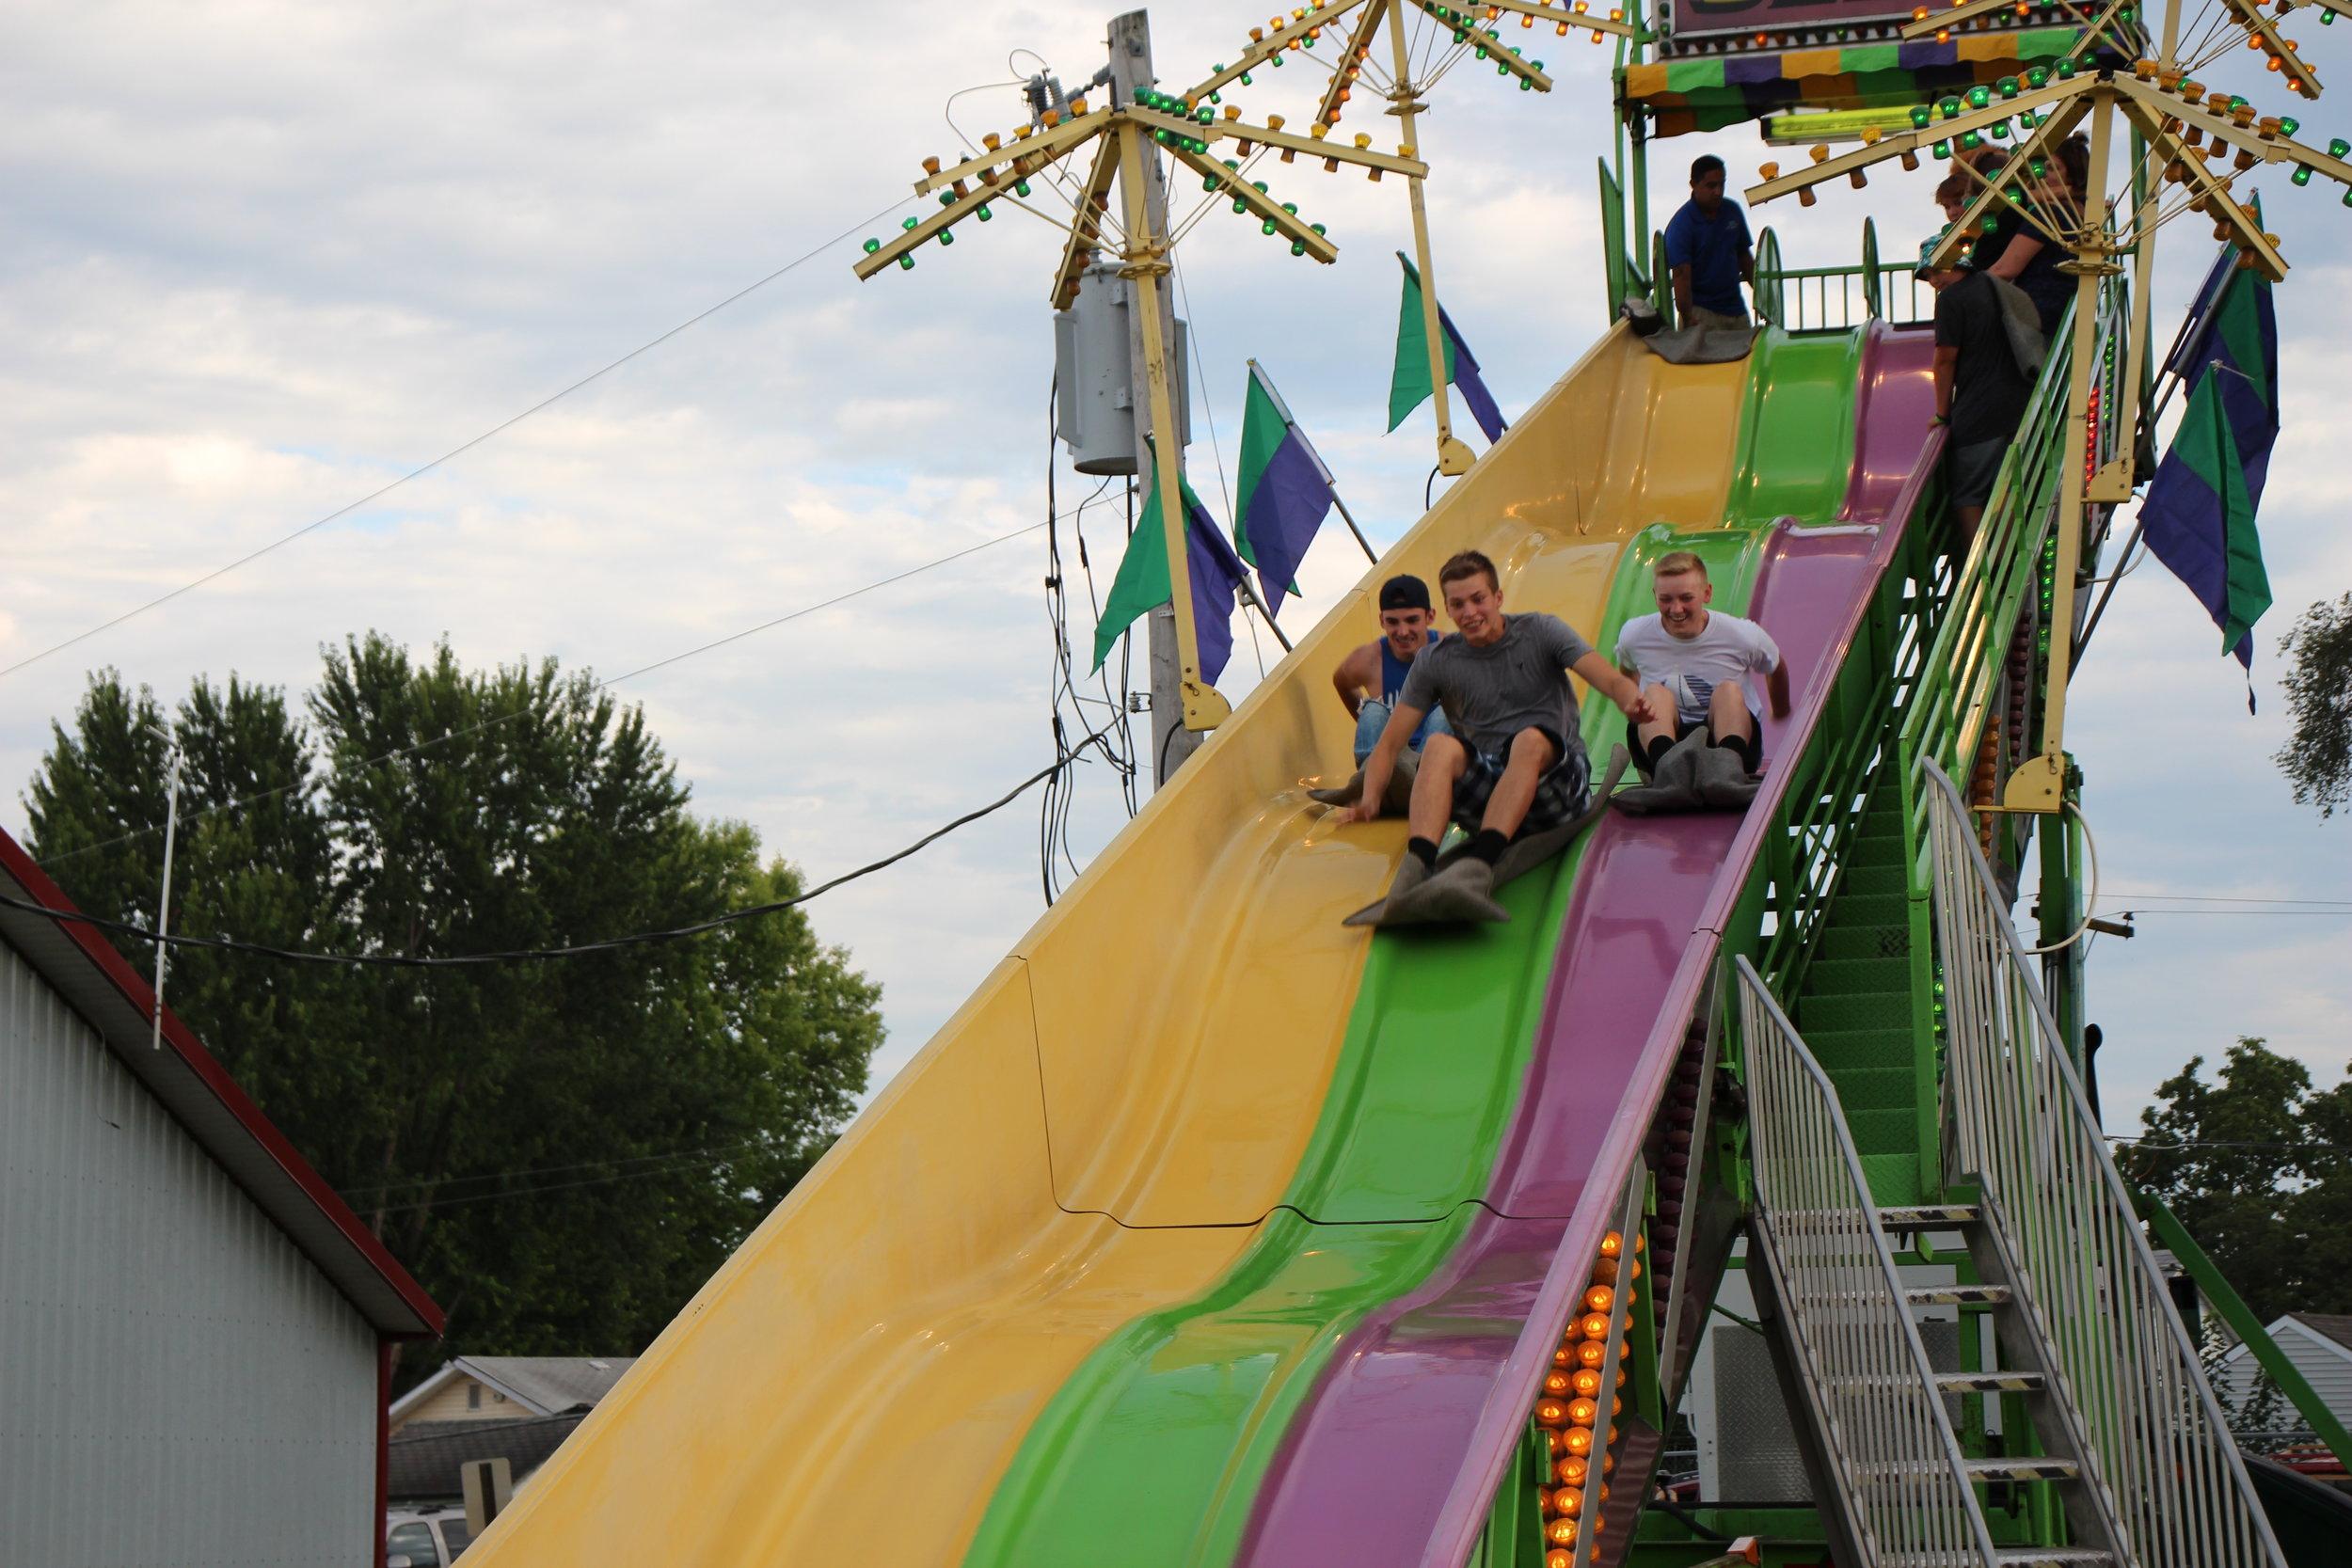 teenagers on slide.JPG